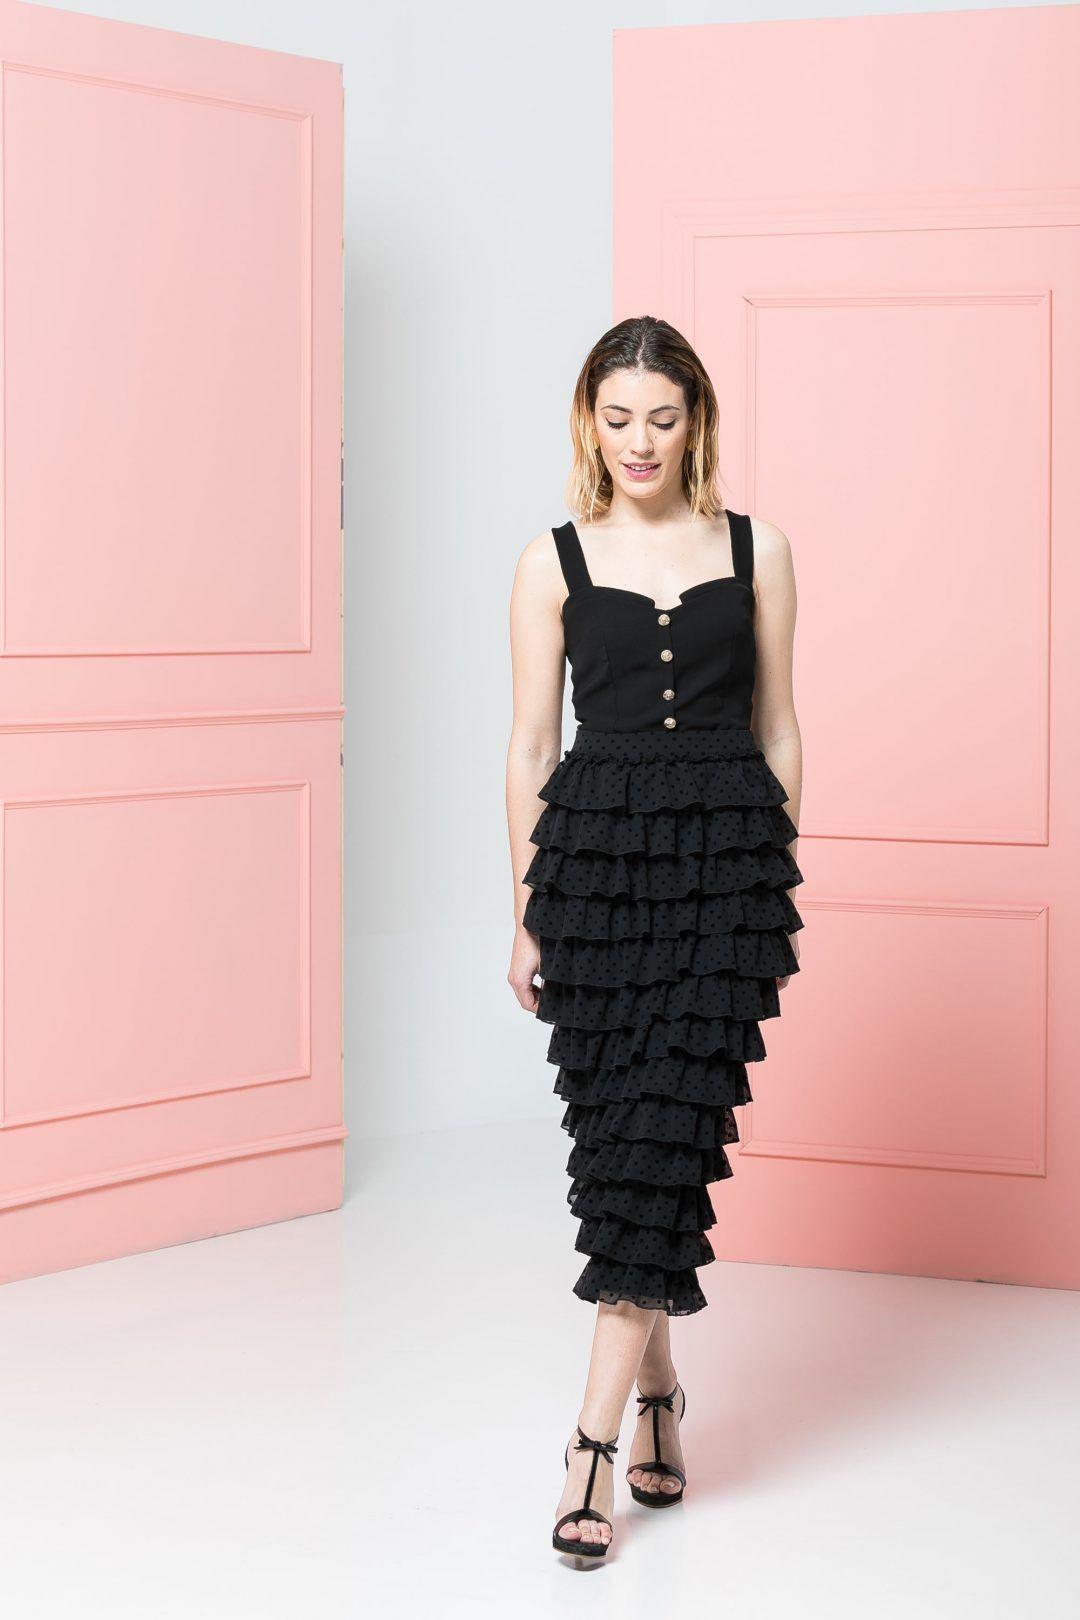 Falda volantes y corset negro | Pinterest